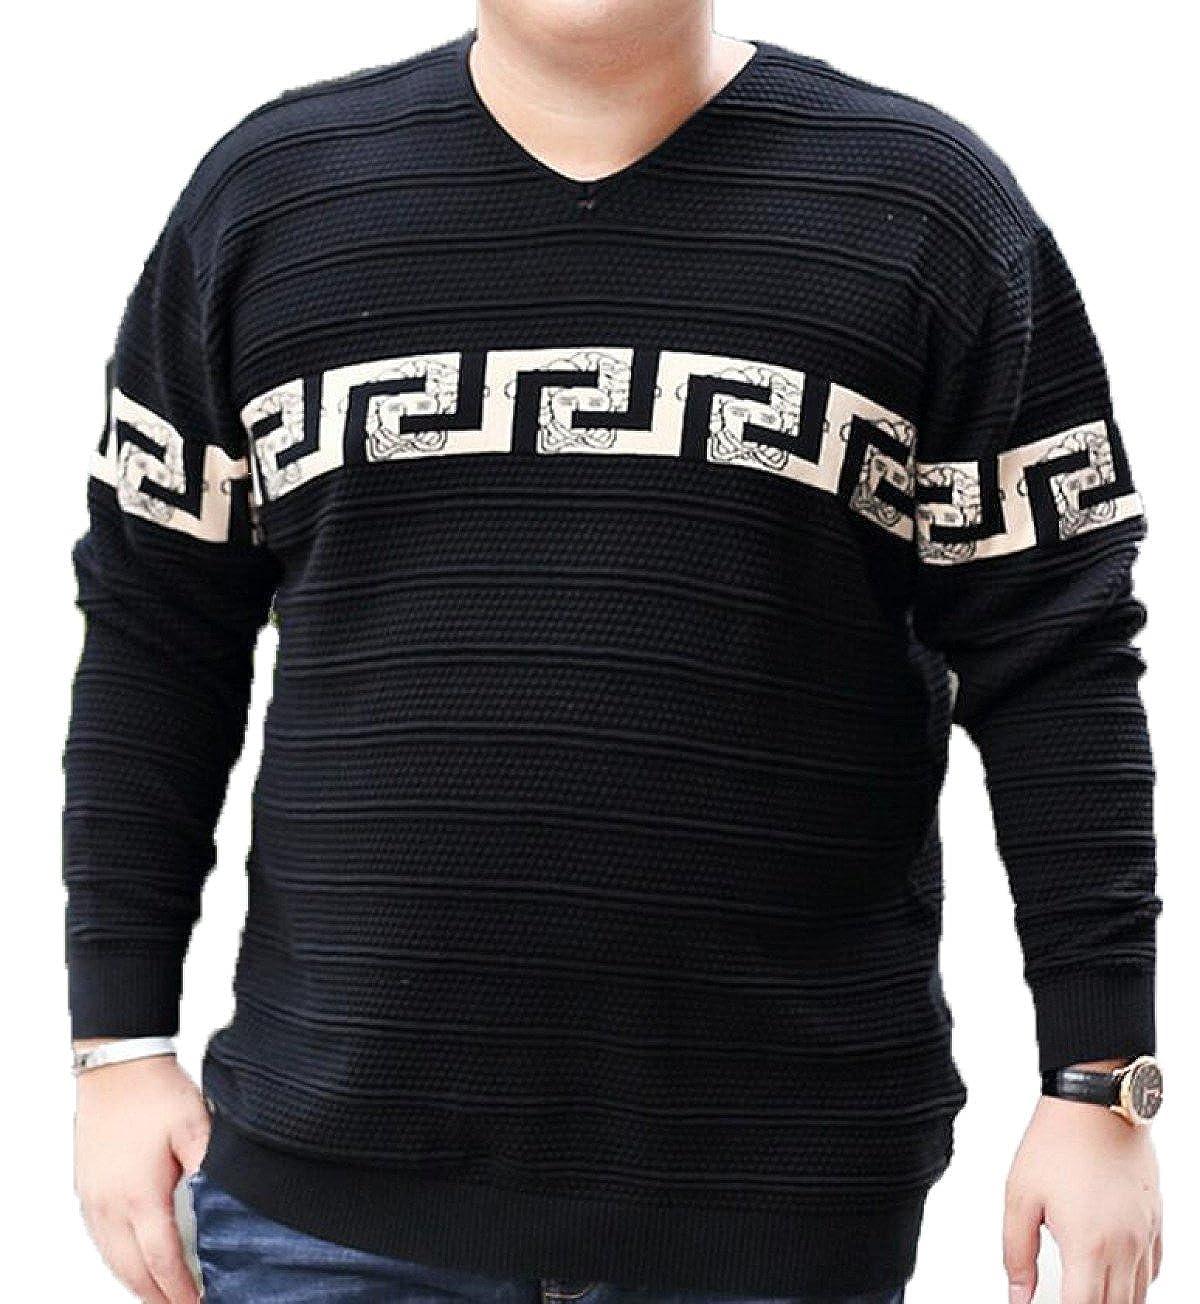 Herren Pullover V-Ausschnitt Pullover Baumwollhemd Pullover Langarm T-Shirt